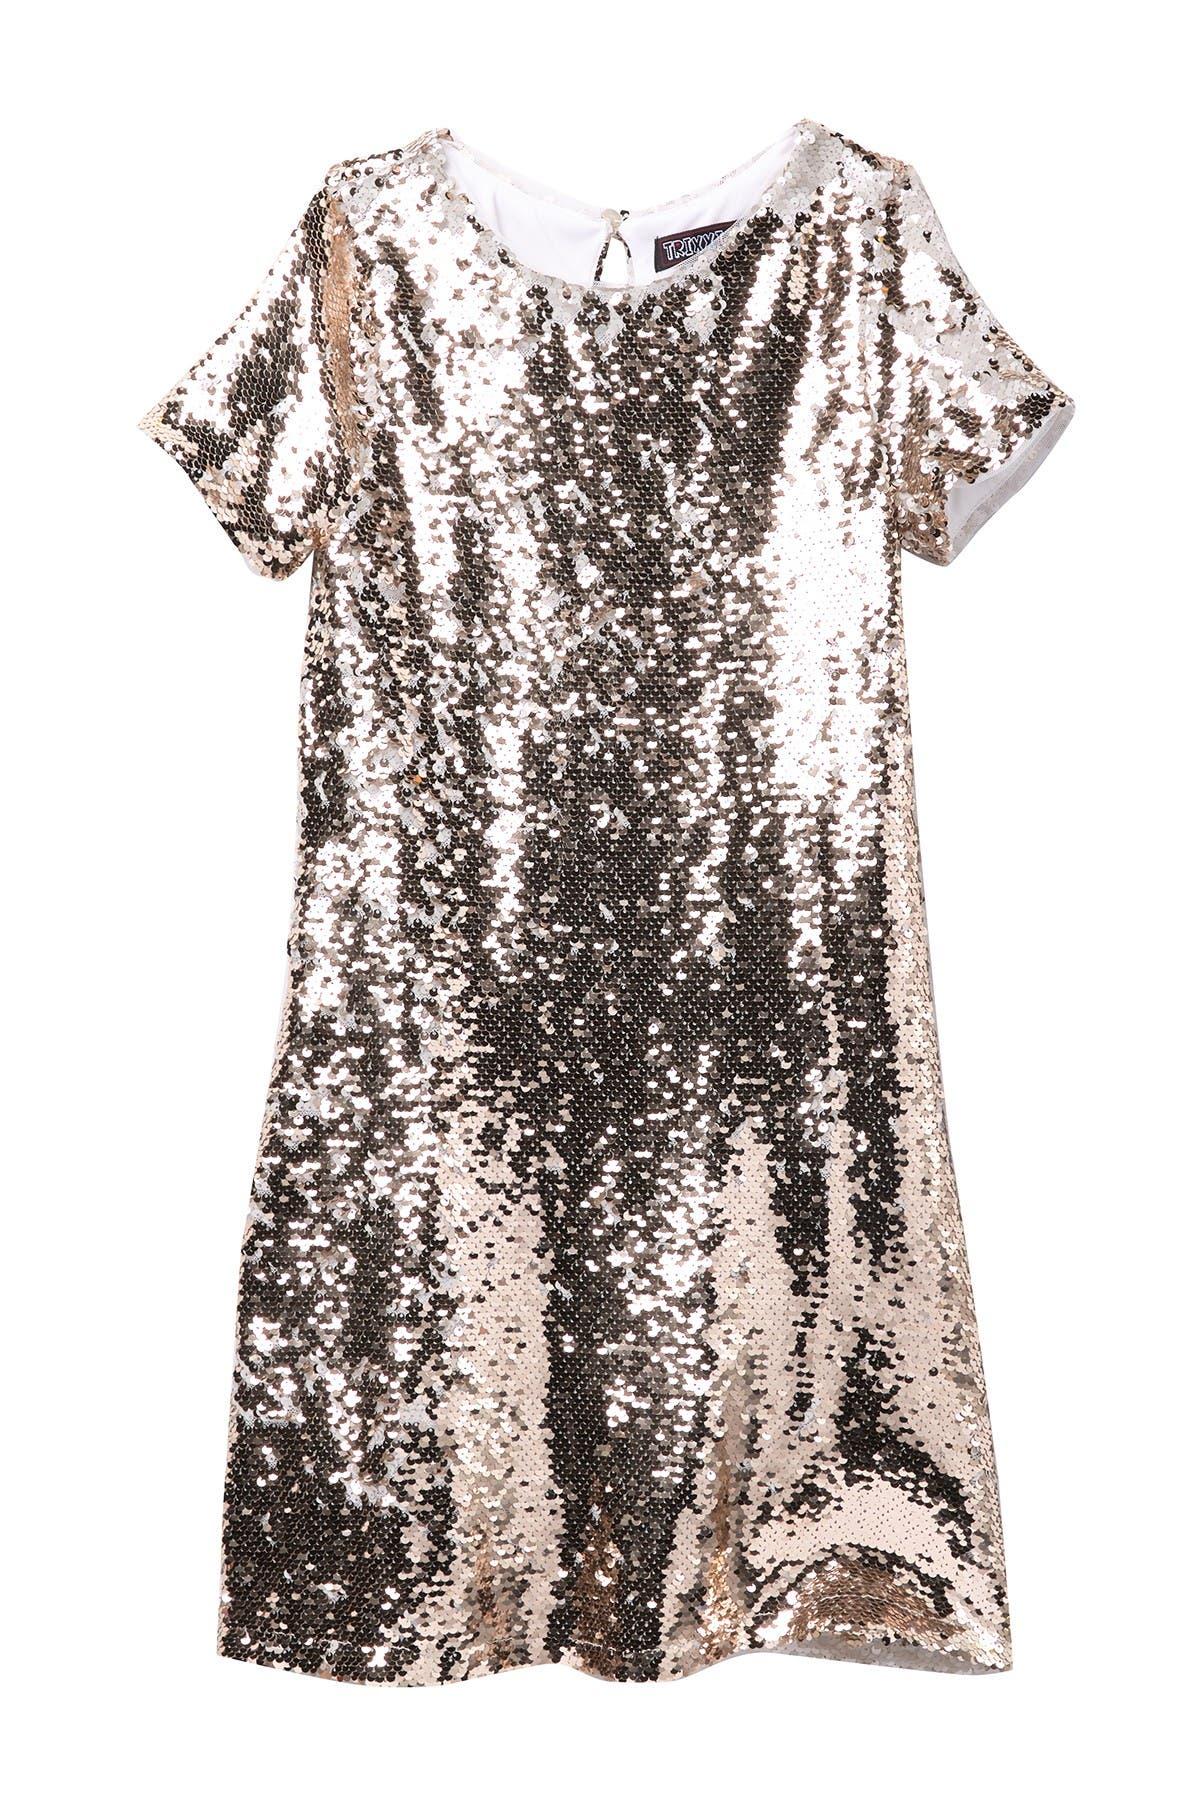 Image of Trixxi Reversible Sequin Tee Dress